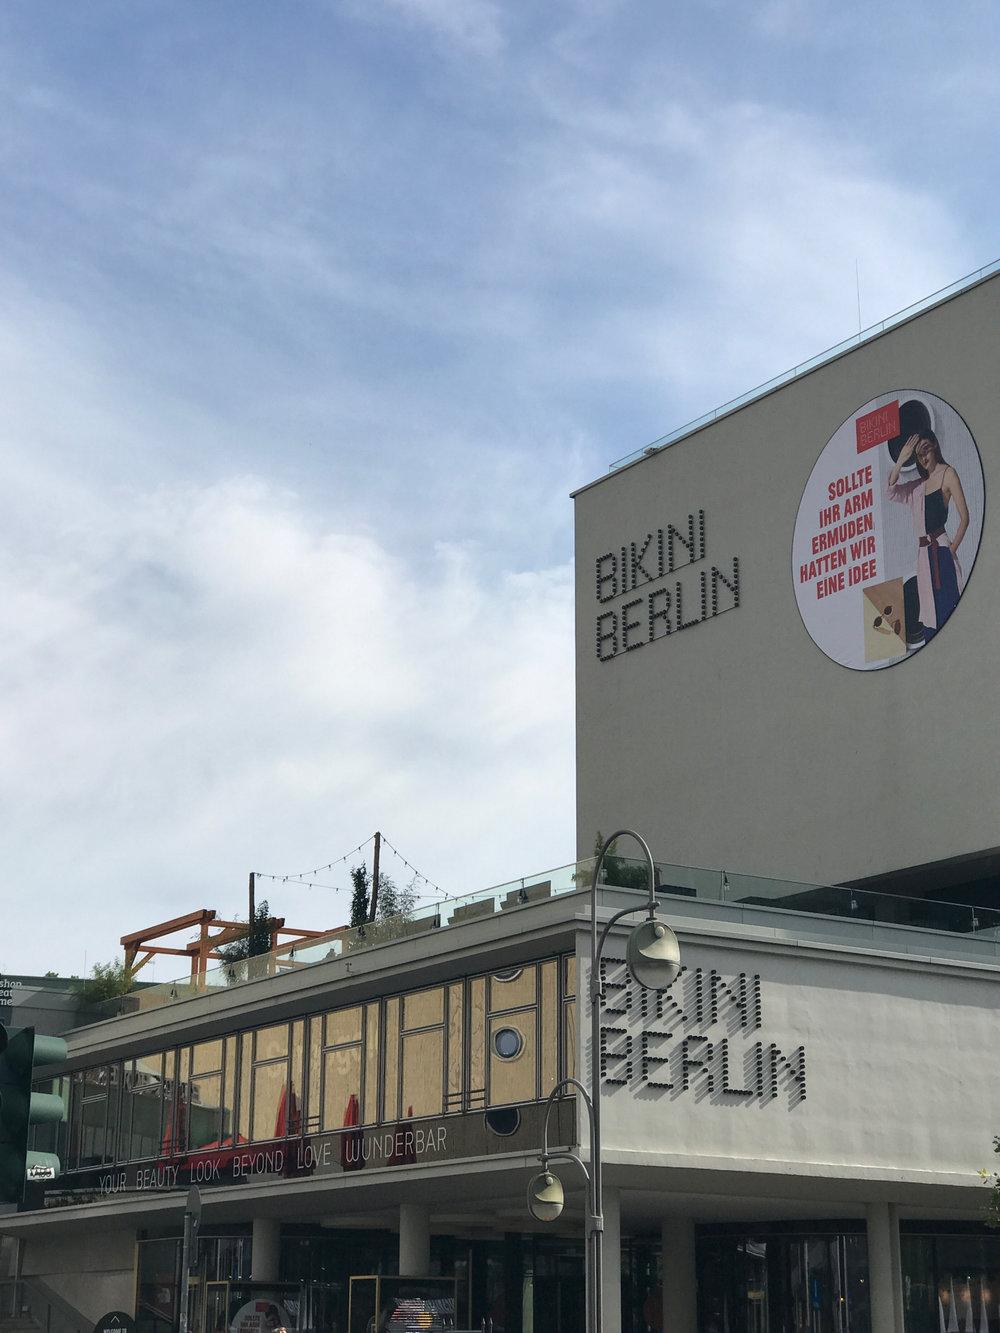 SPREEGOLD ROOFTOP IN BIKINI BERLIN